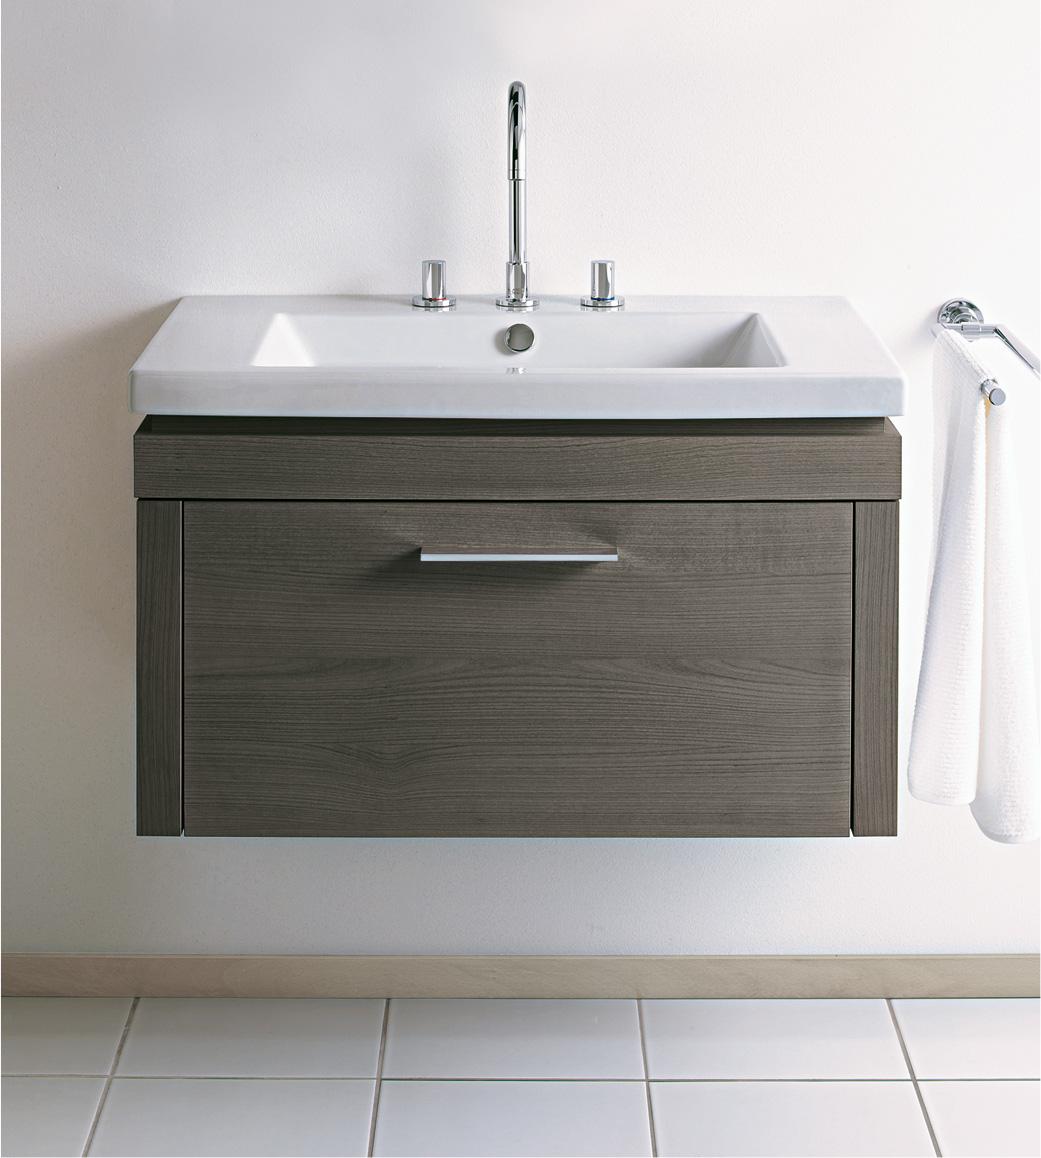 2nd floor basins toilets bathtubs duravit. Black Bedroom Furniture Sets. Home Design Ideas